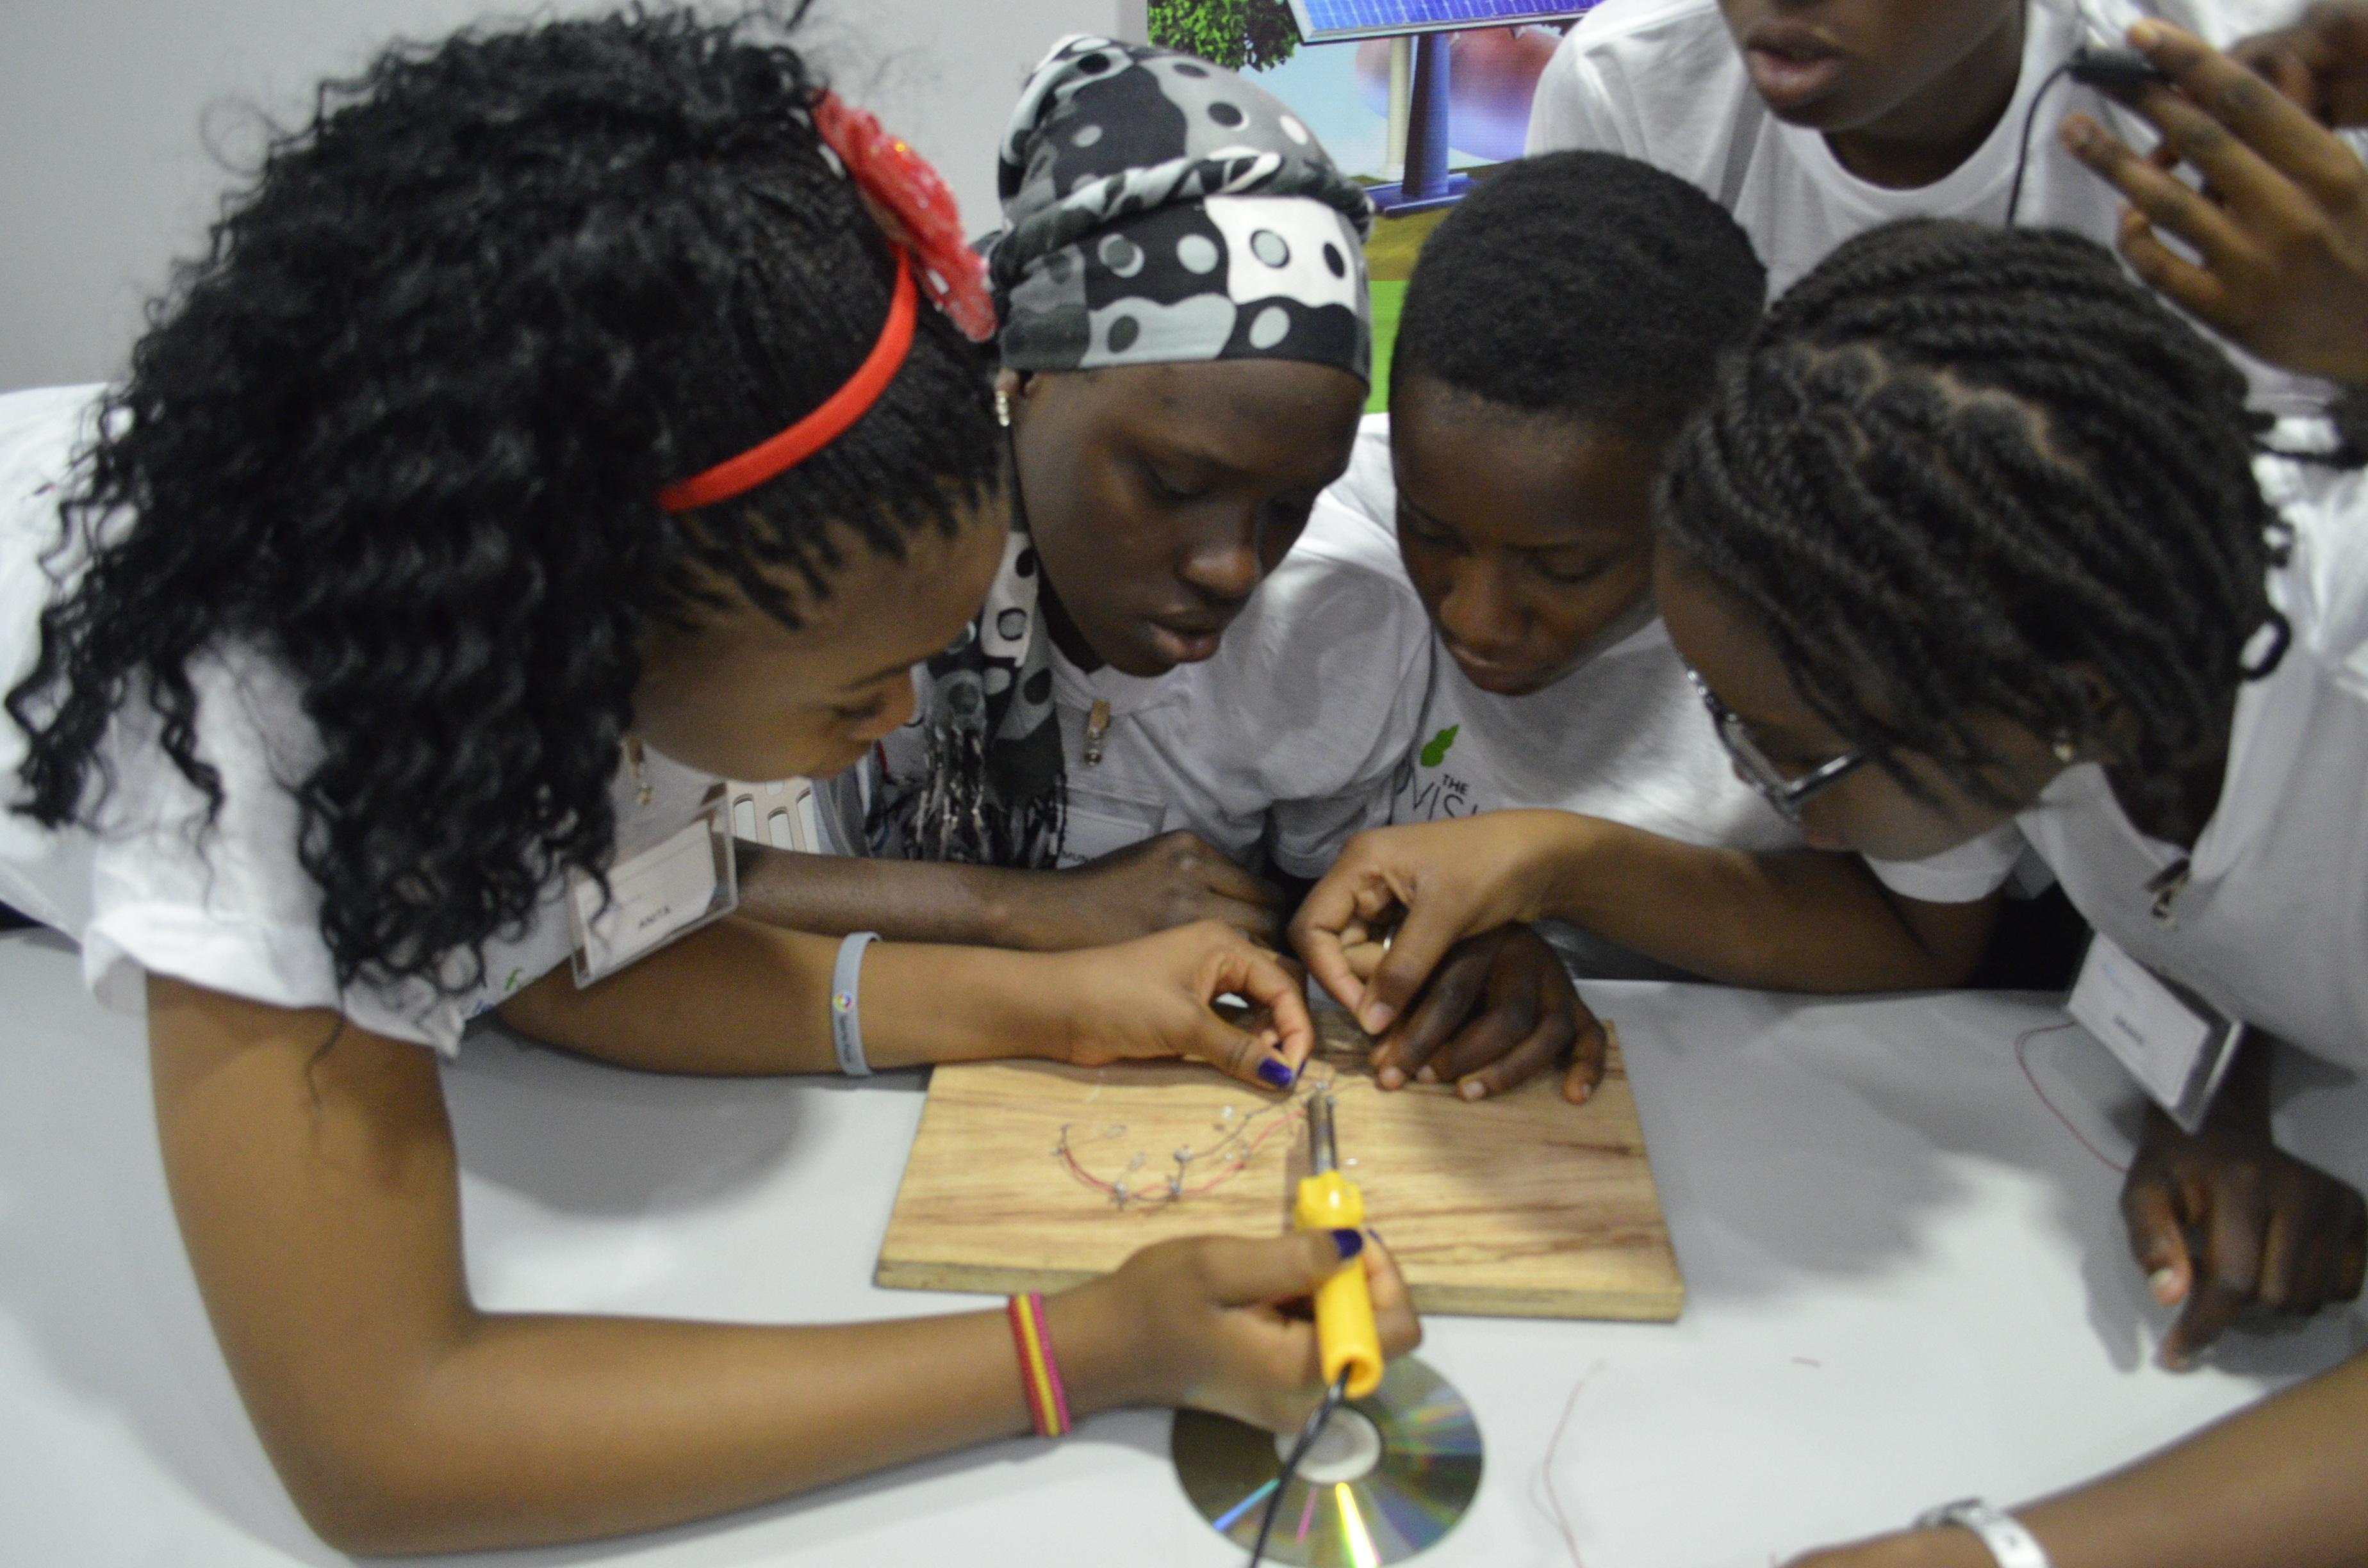 2018 STEM Summer Camp